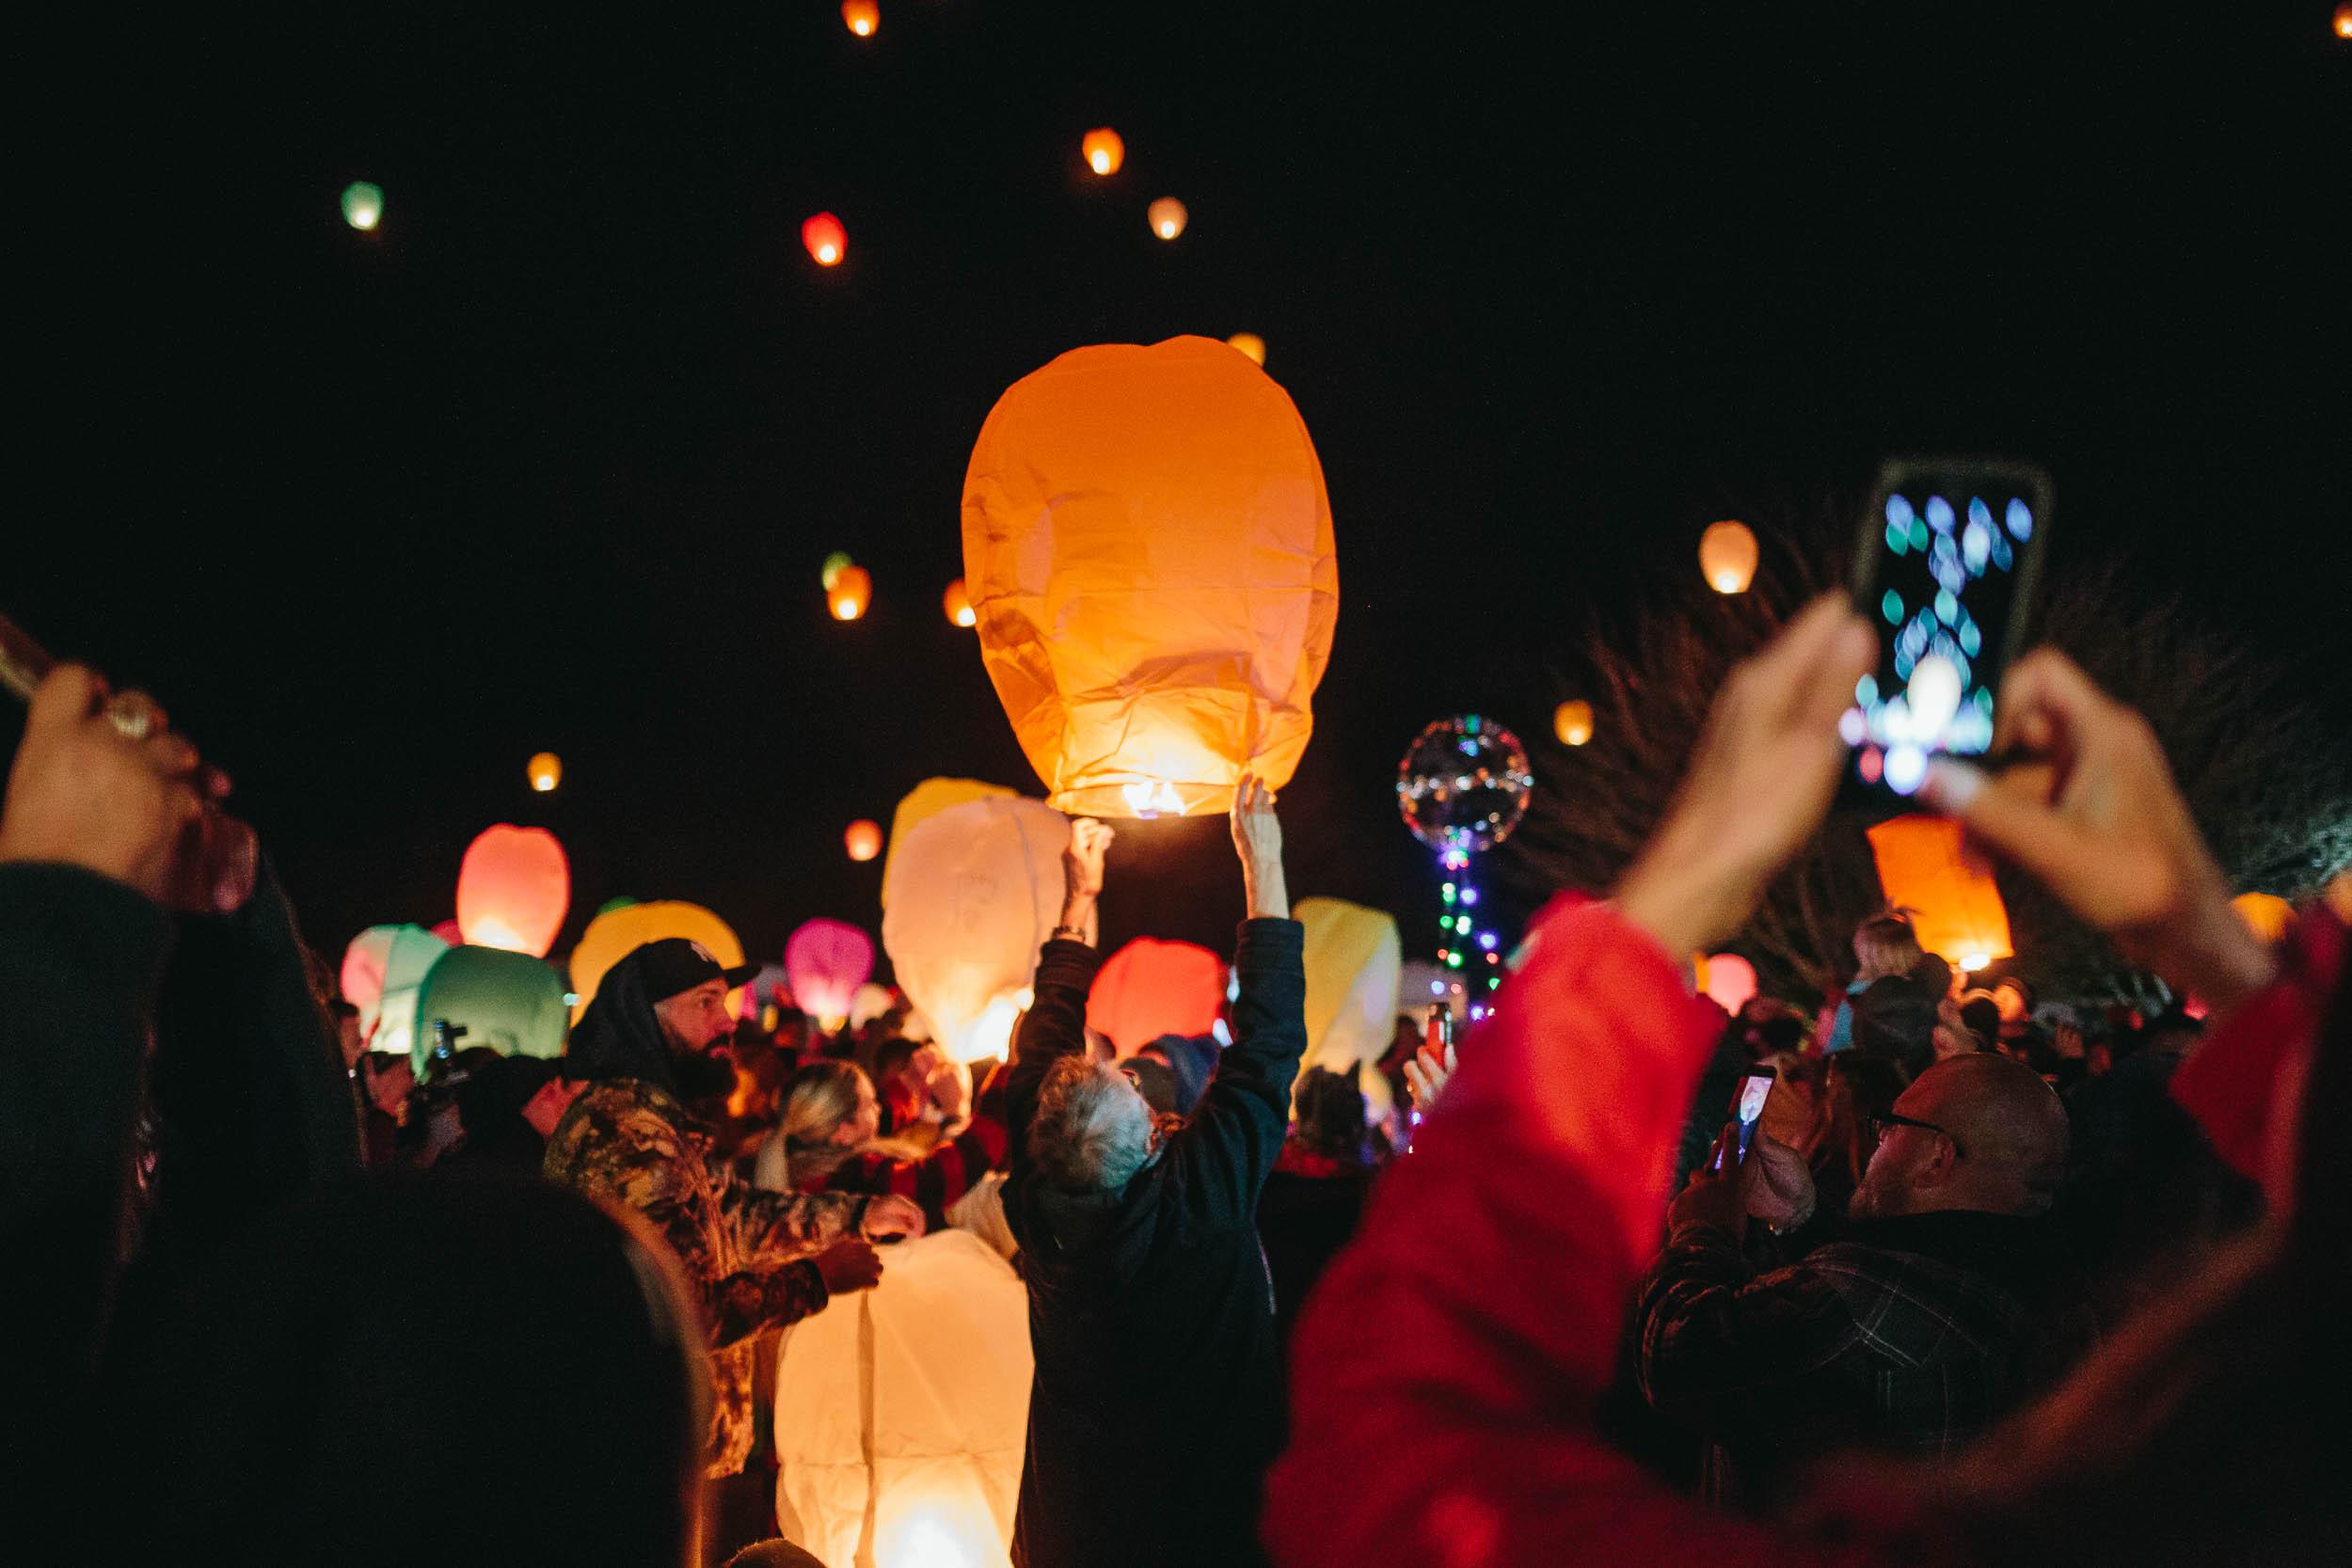 Kyle-Sheppard-Kanab-Balloon-Festival-55.jpg